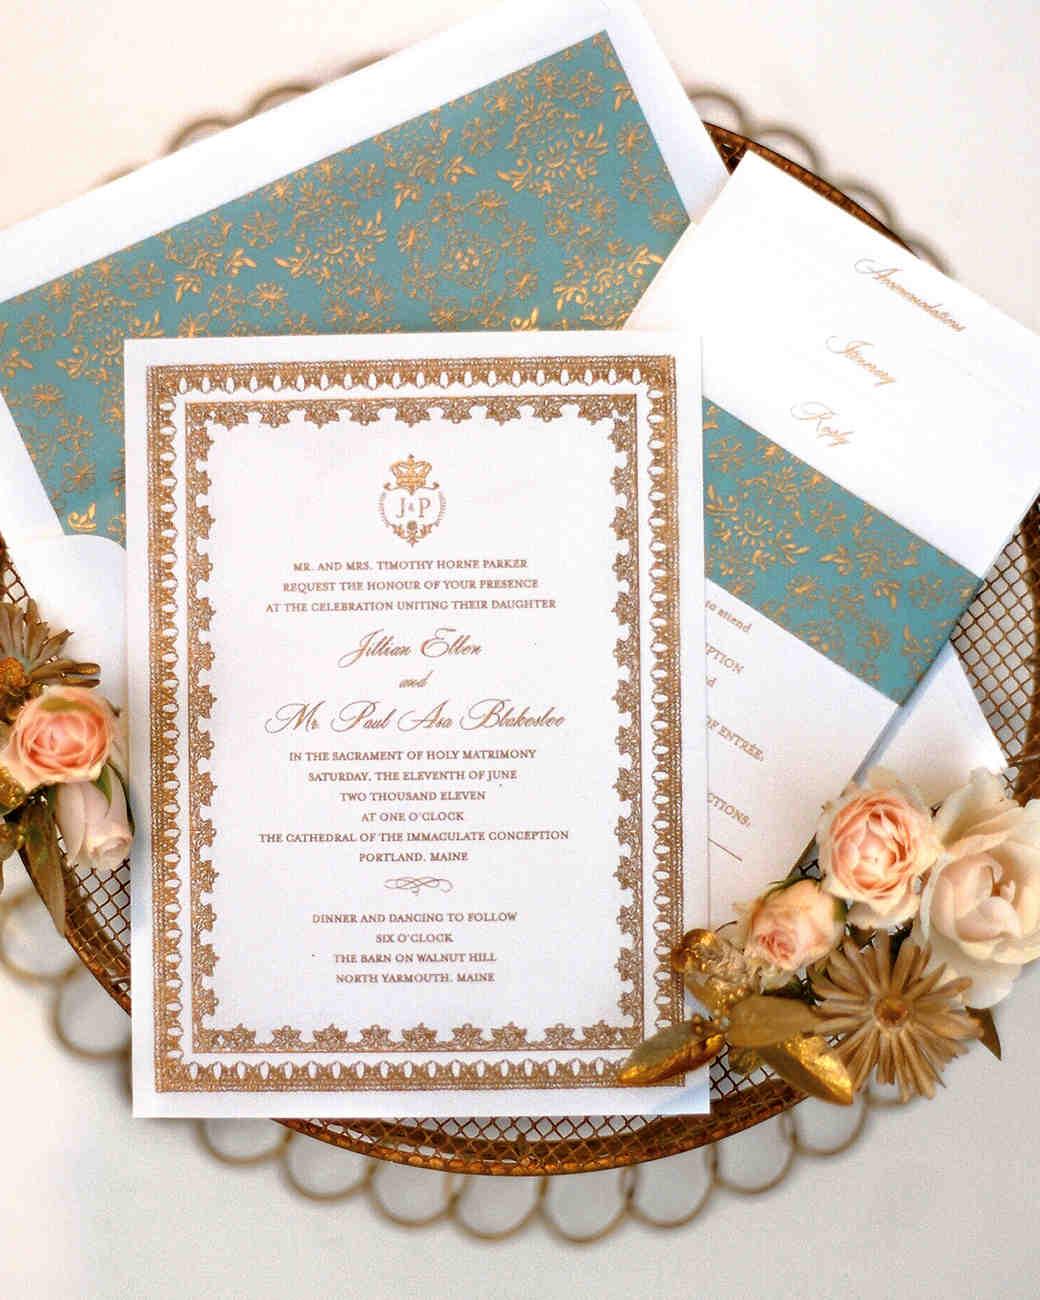 A Vintage-Inspired Formal Wedding in Maine | Martha Stewart Weddings